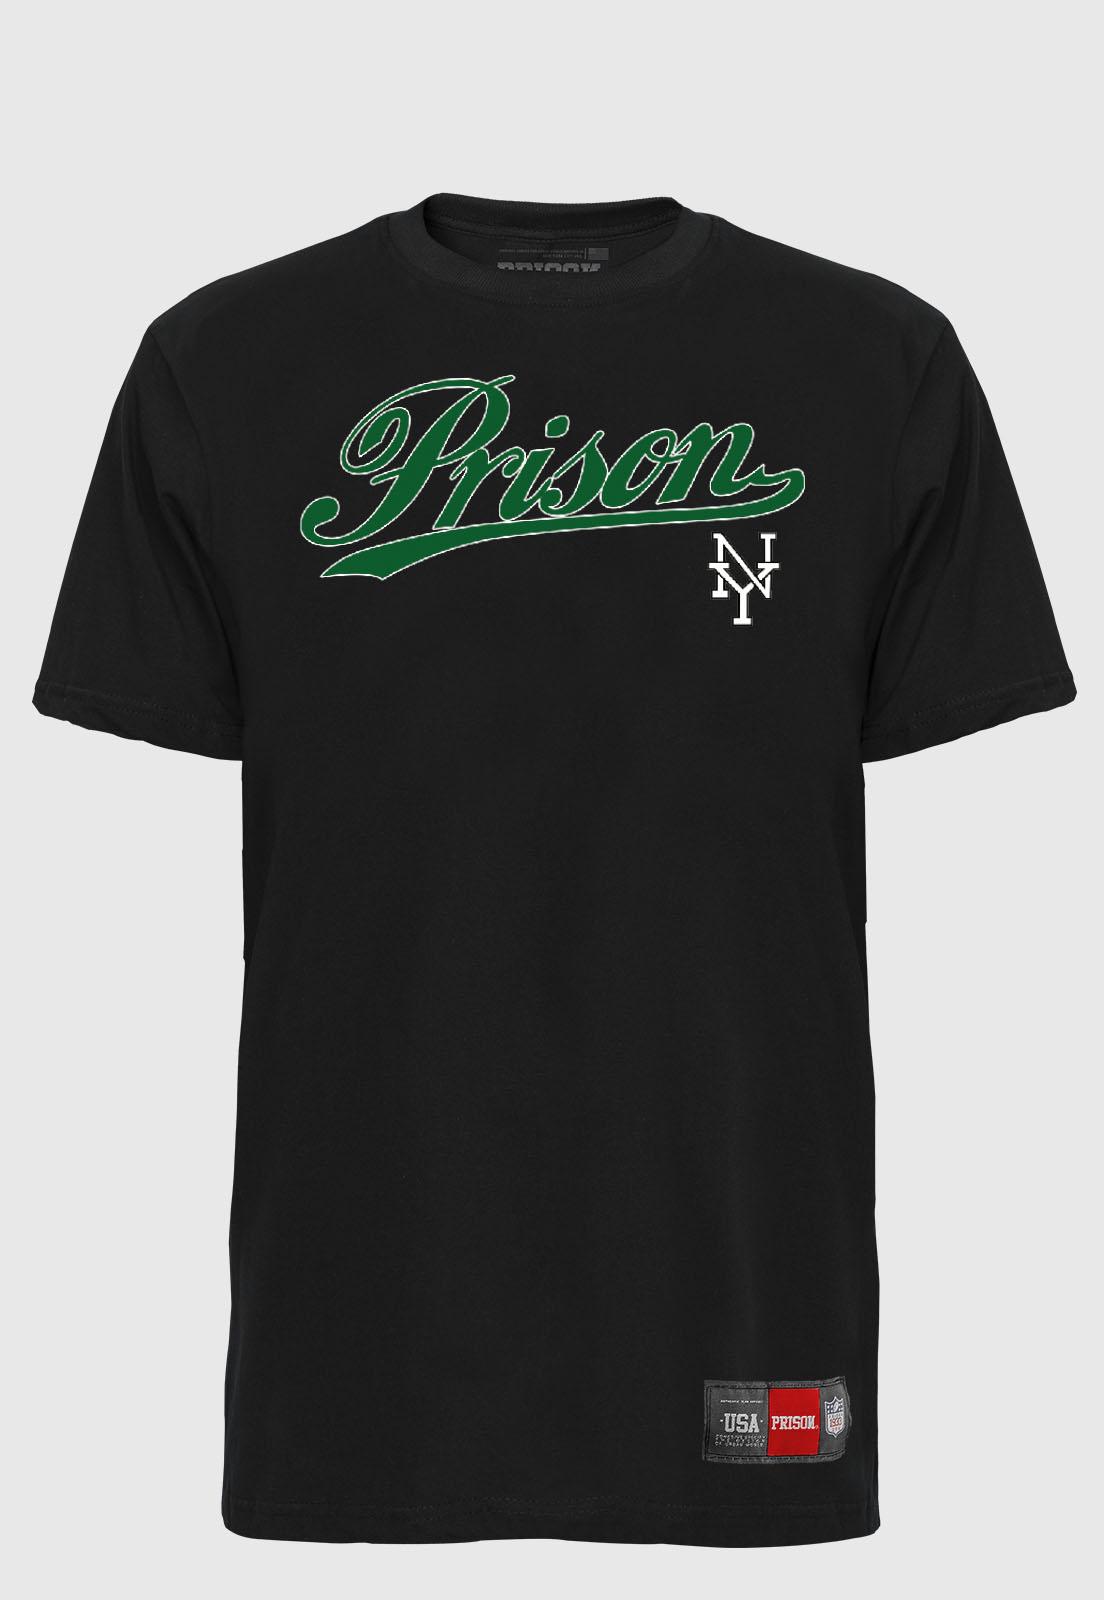 Camiseta Streetwear Prison green NY